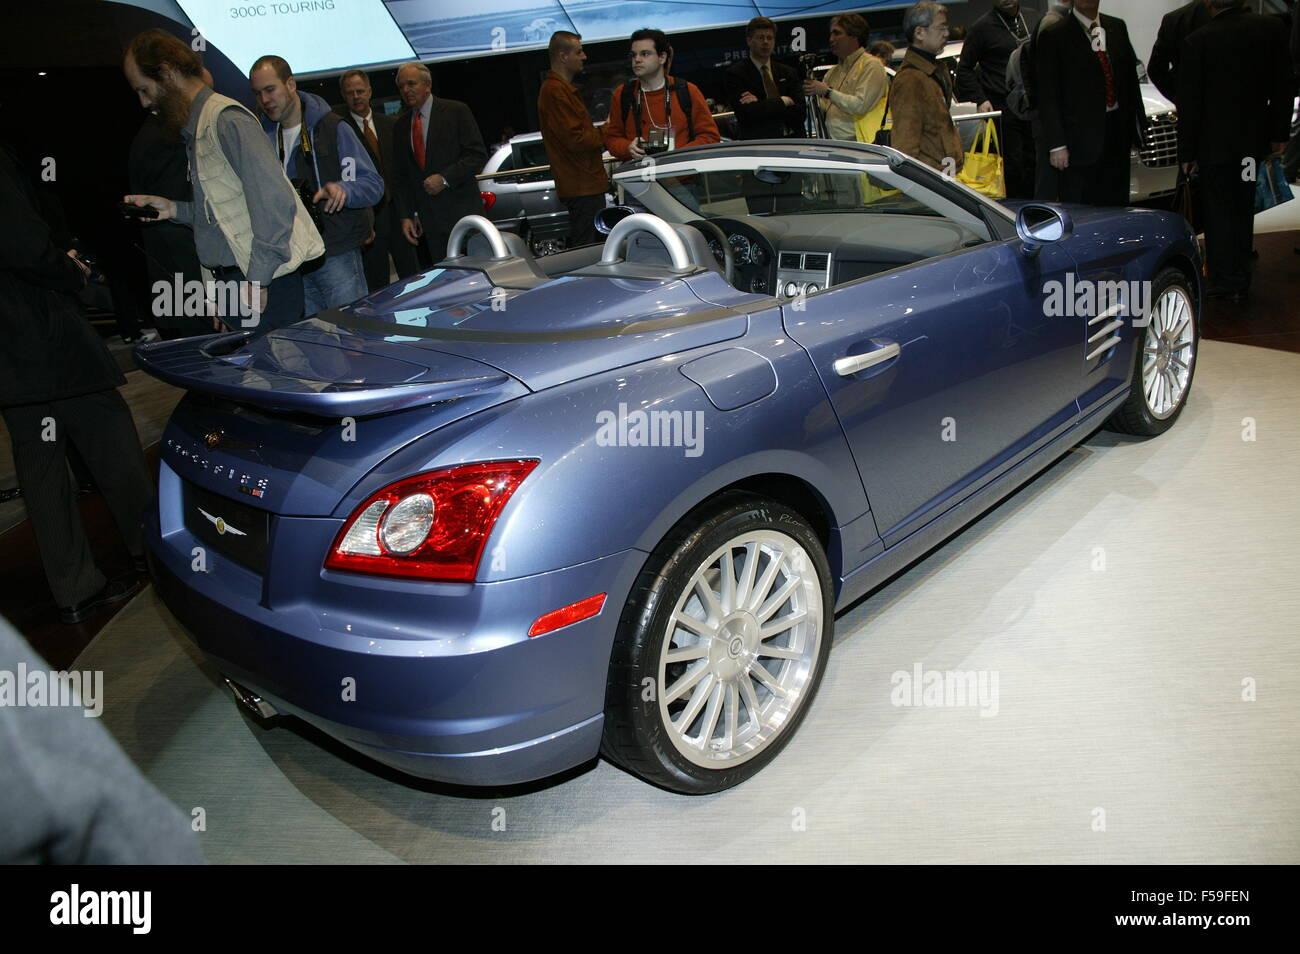 Chrysler Crossfire SRT-6 At the Geneva Motorshow 2004 - this car is based on the mercedes SLK chassis - Stock Image